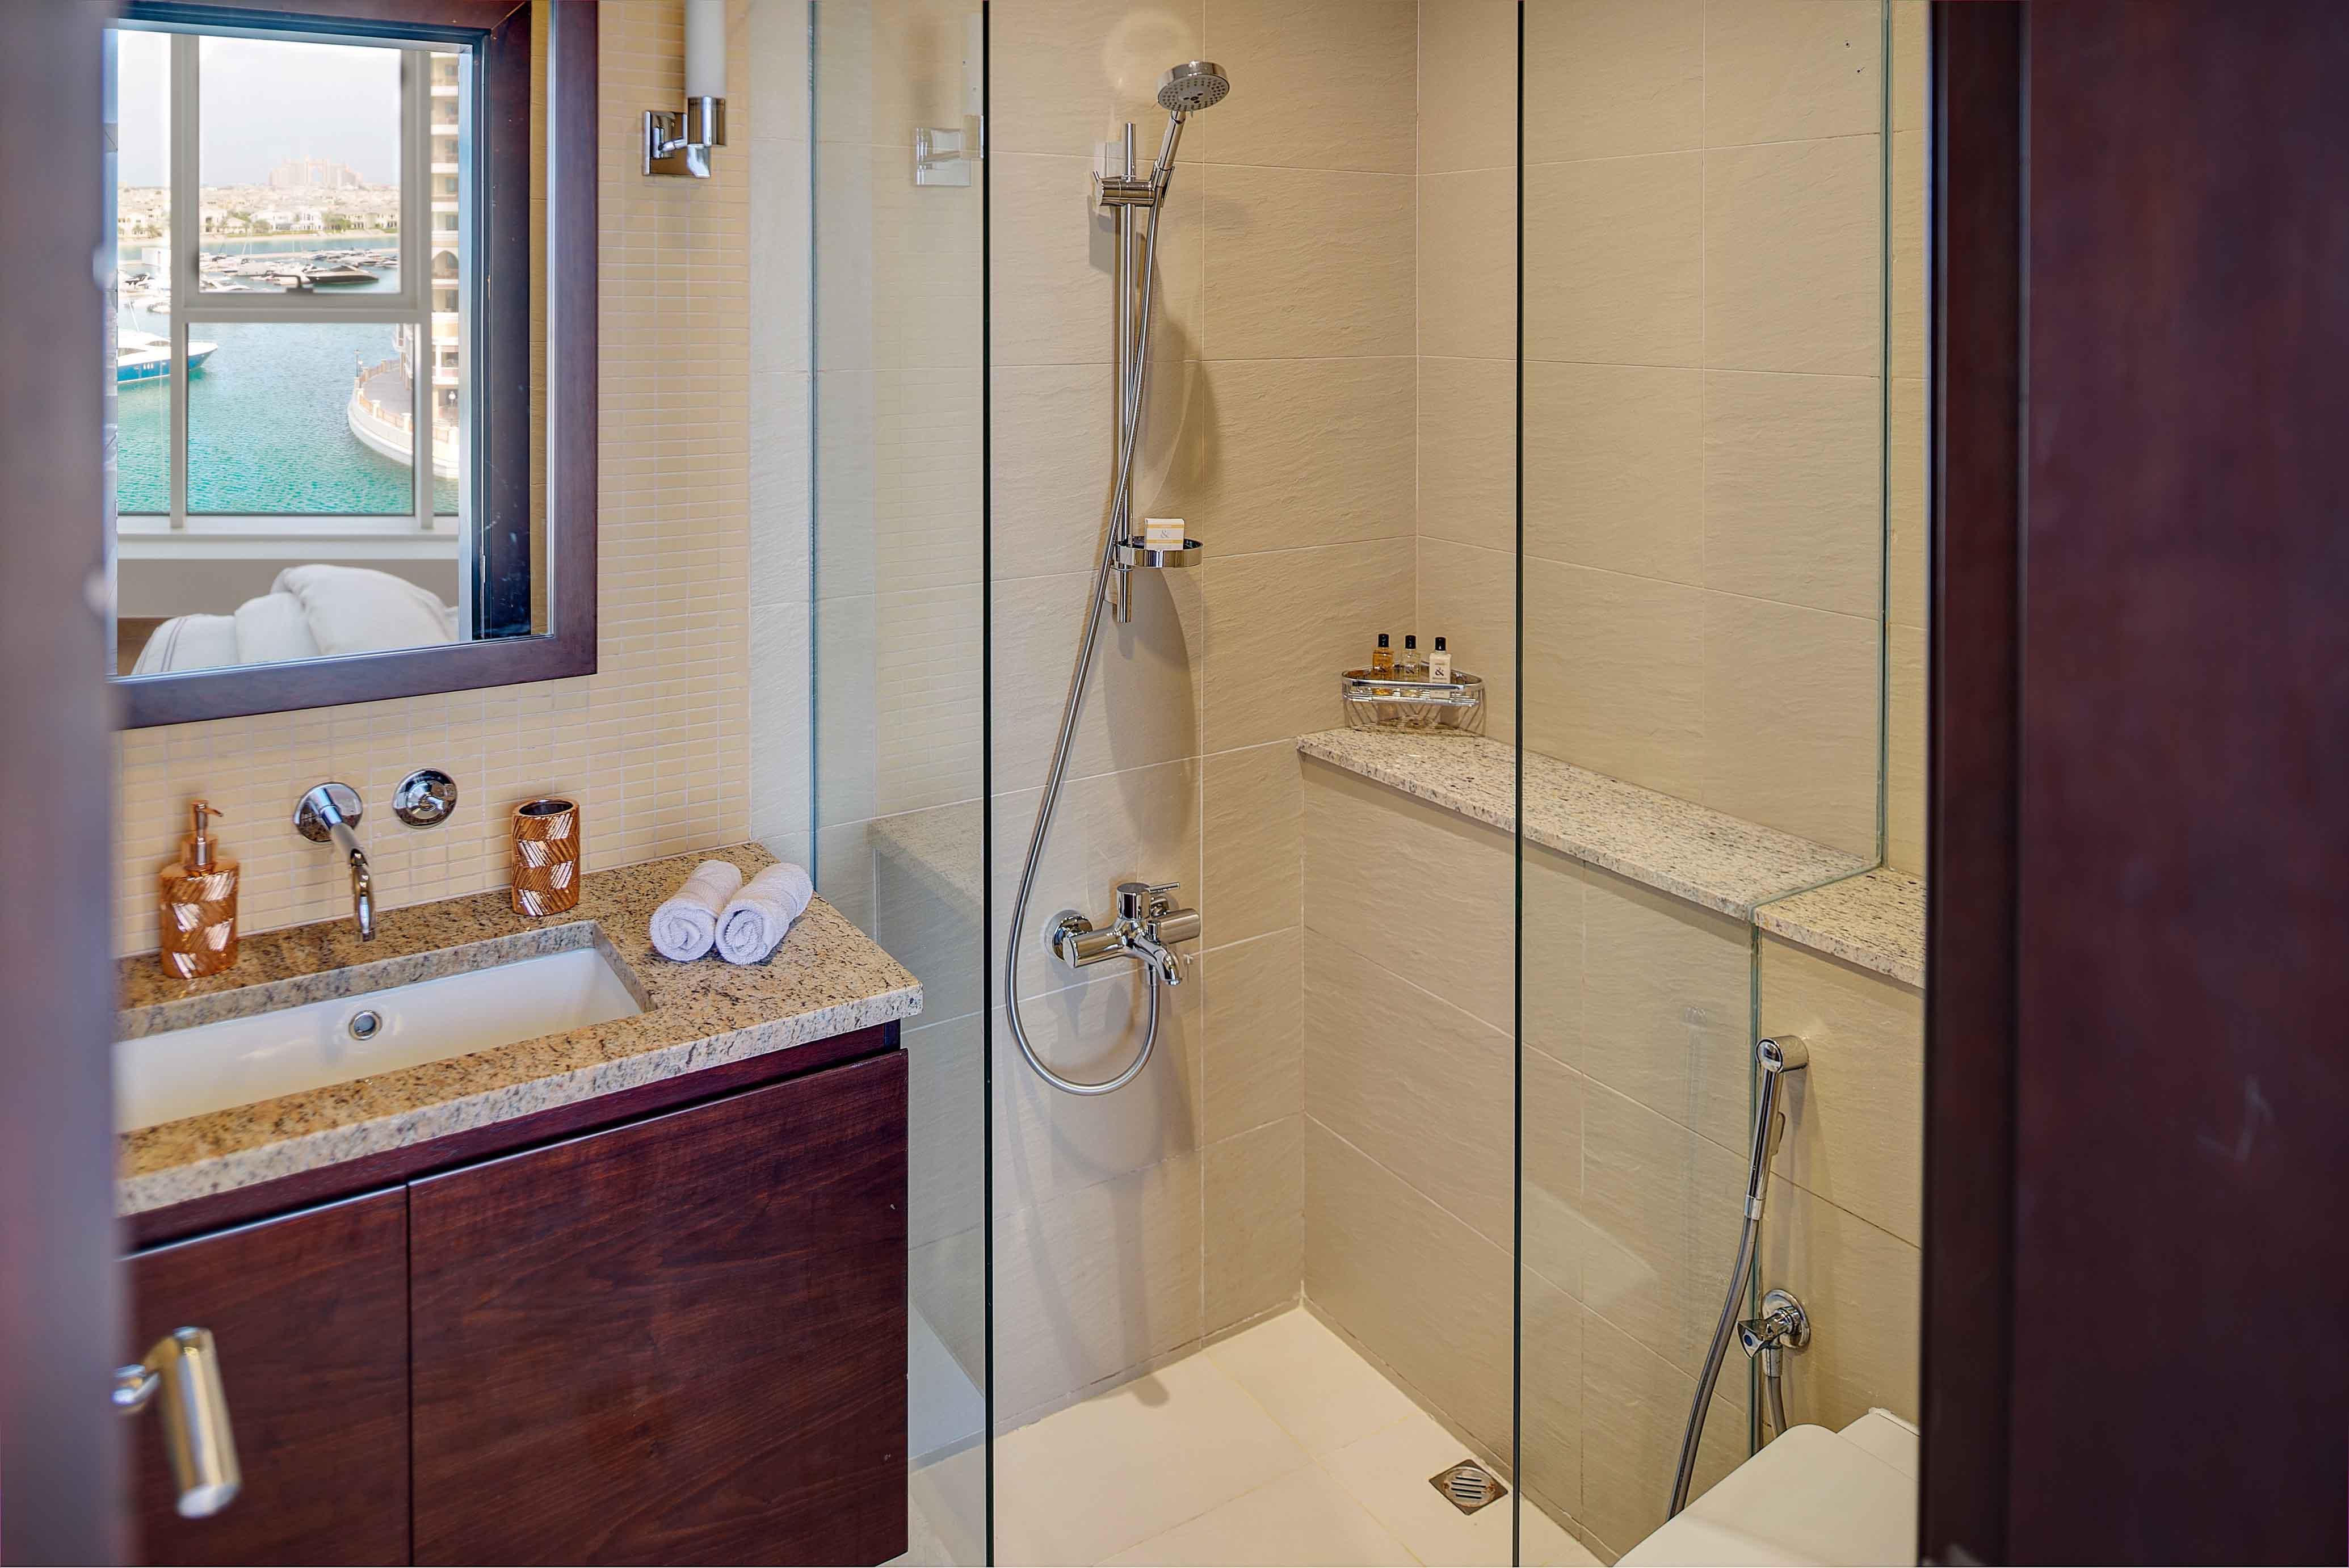 Shower at Tiara Tower Apartments